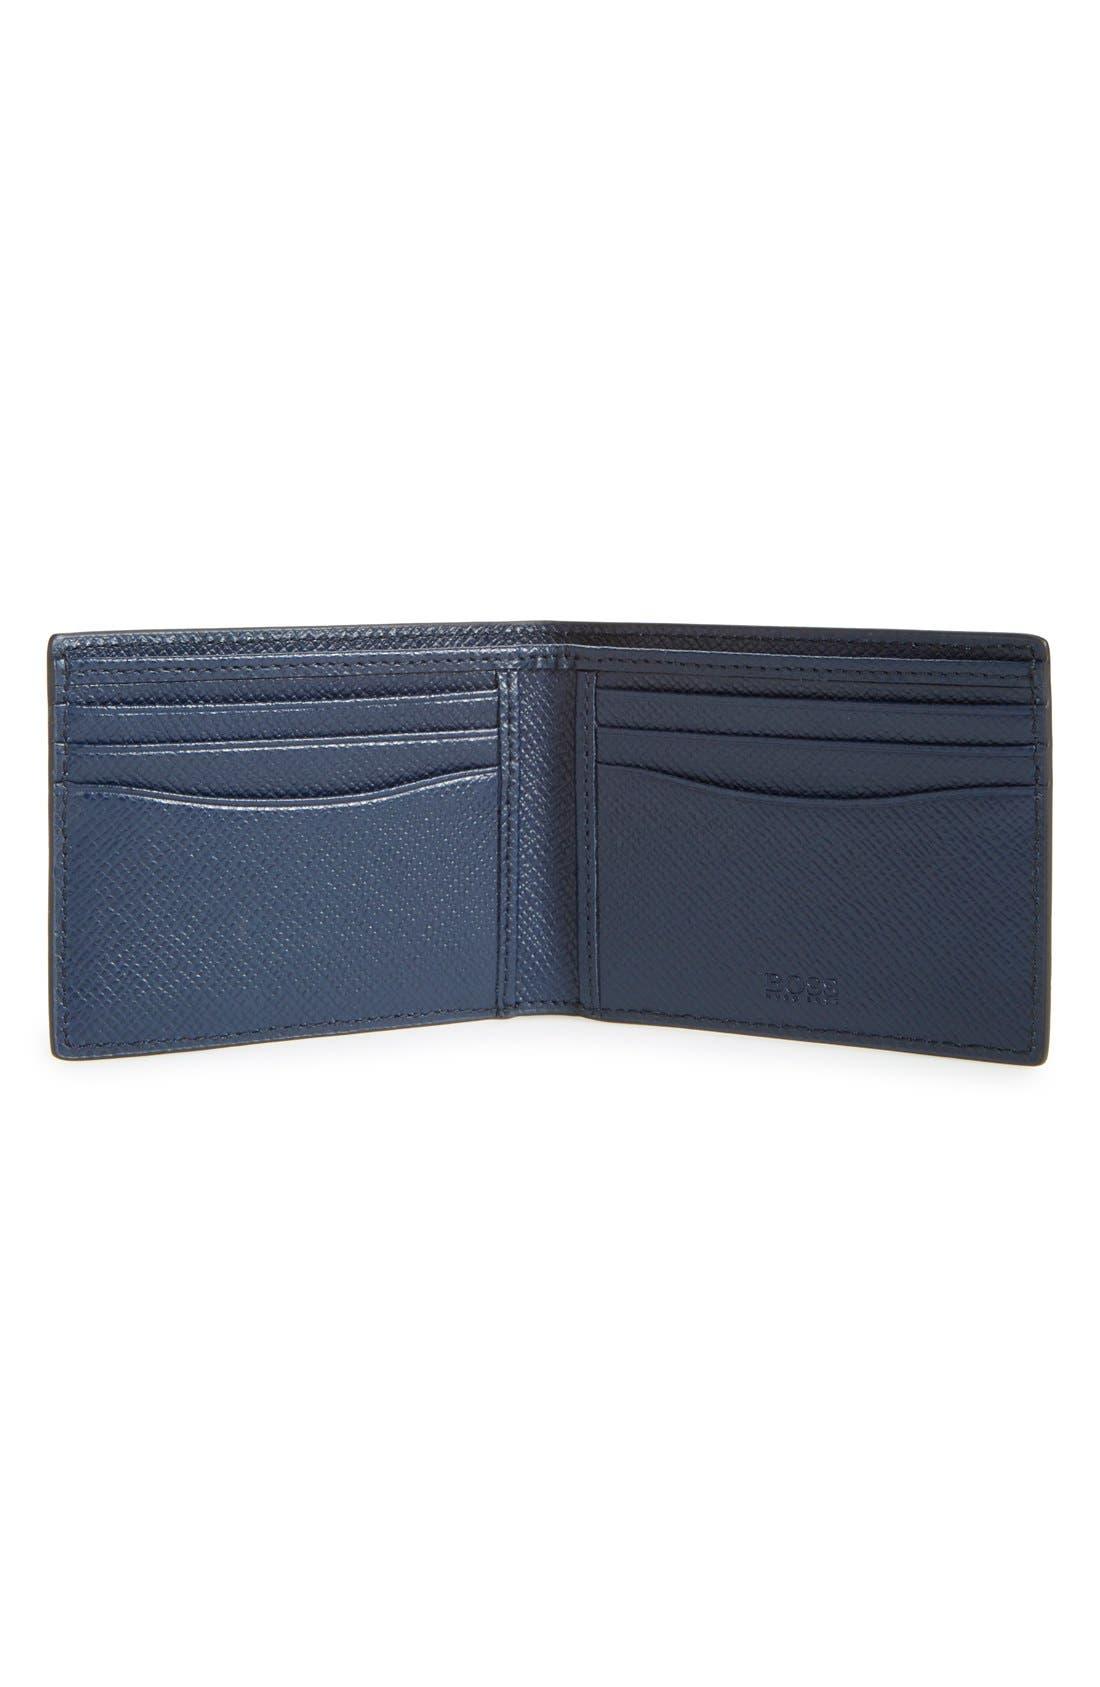 'Signature' Bifold Wallet,                             Alternate thumbnail 11, color,